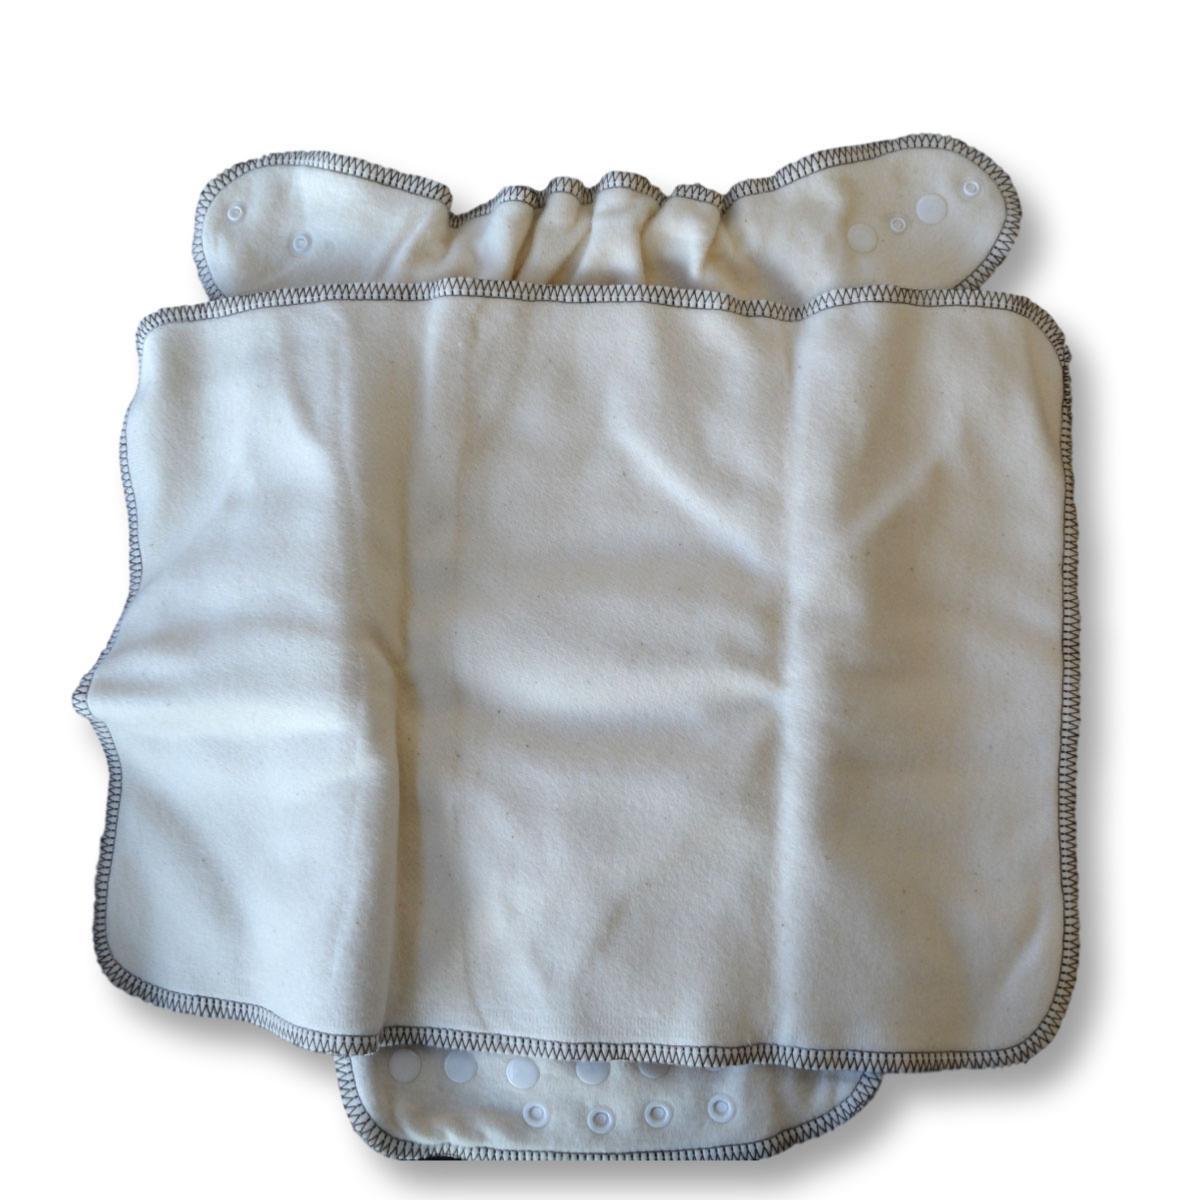 Pañal ajustado unitalla de algodón orgánico Lulu Nature